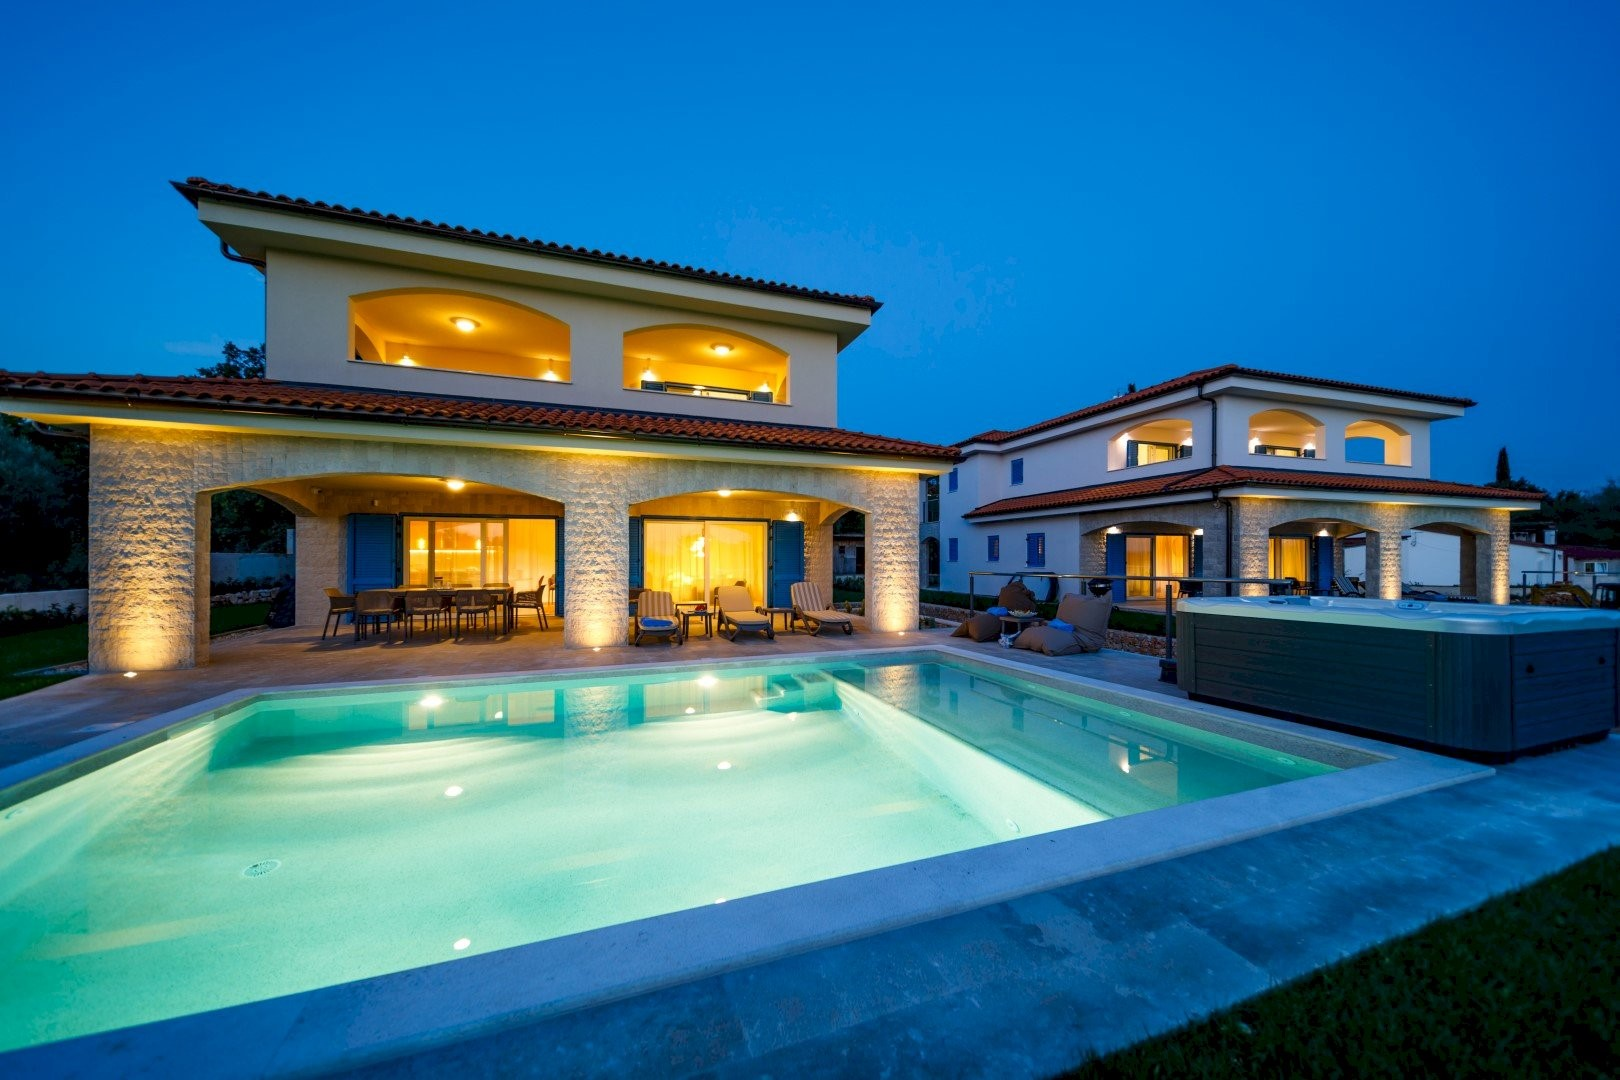 Ferienhaus Luxury Villa Loma 2 (2586643), Sveti Vid-Miholjice, Insel Krk, Kvarner, Kroatien, Bild 2